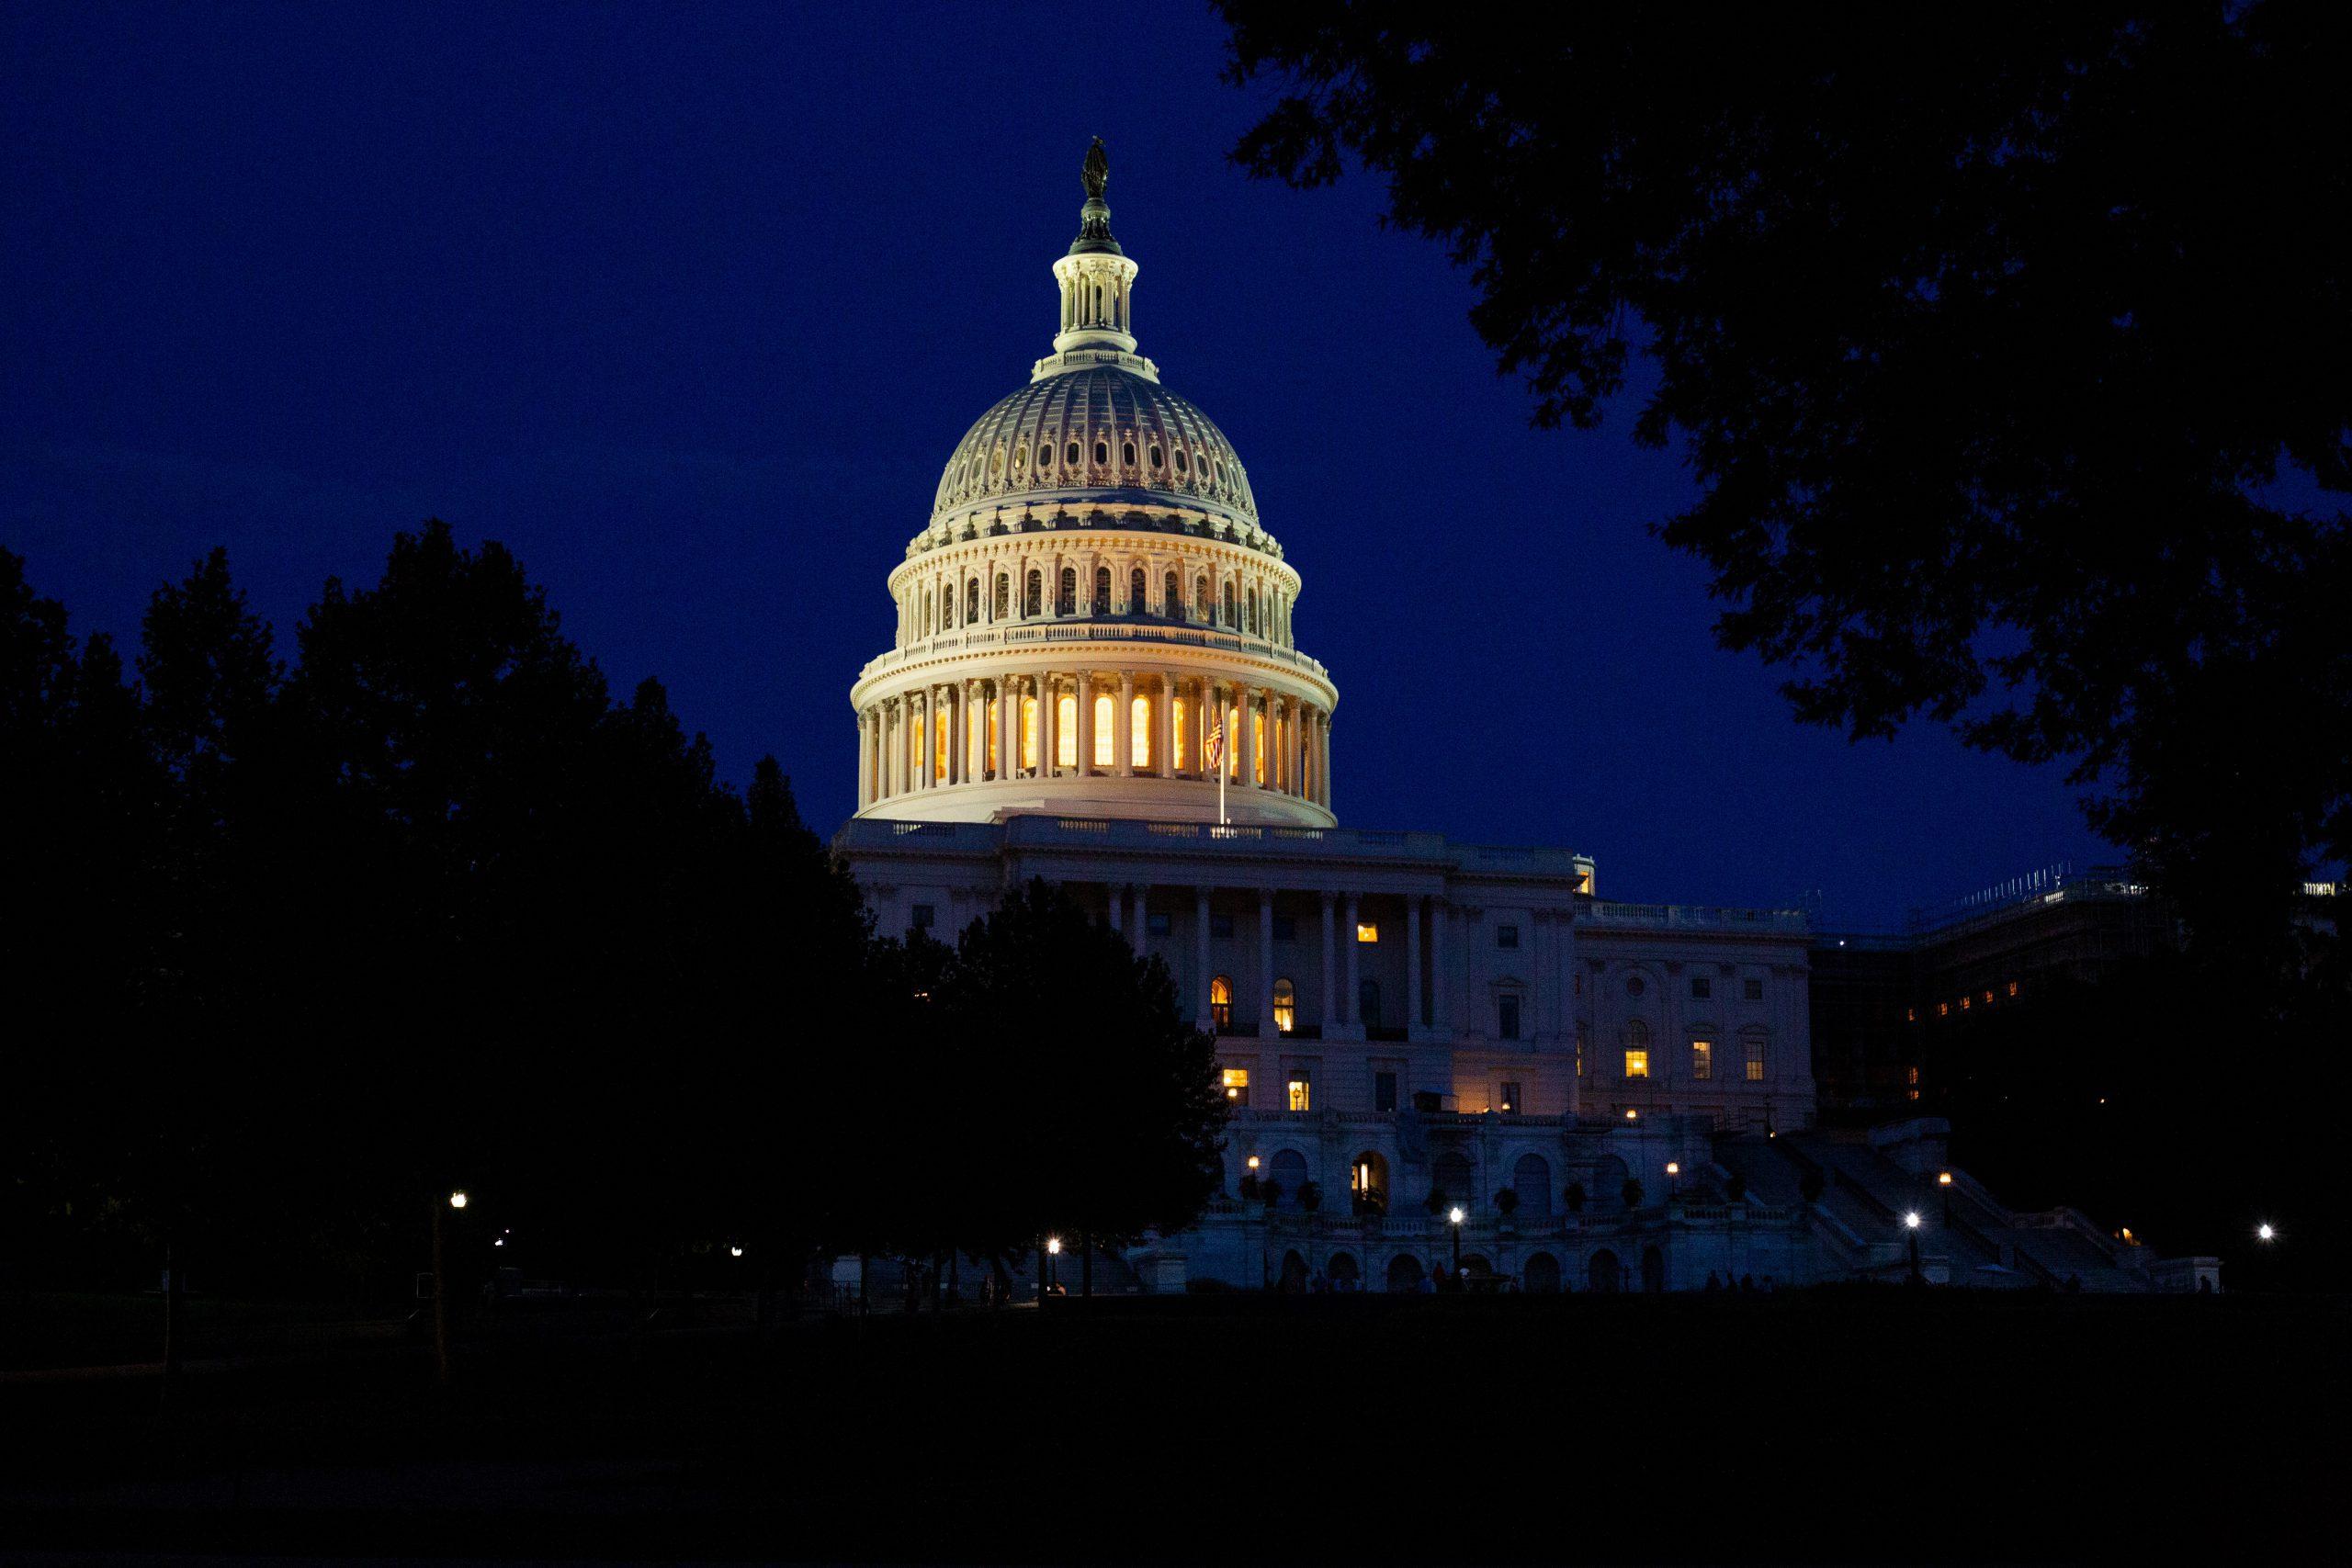 COVID-19 Market Update: Investors Hopeful US Congress Will Strike Stimulus Deal